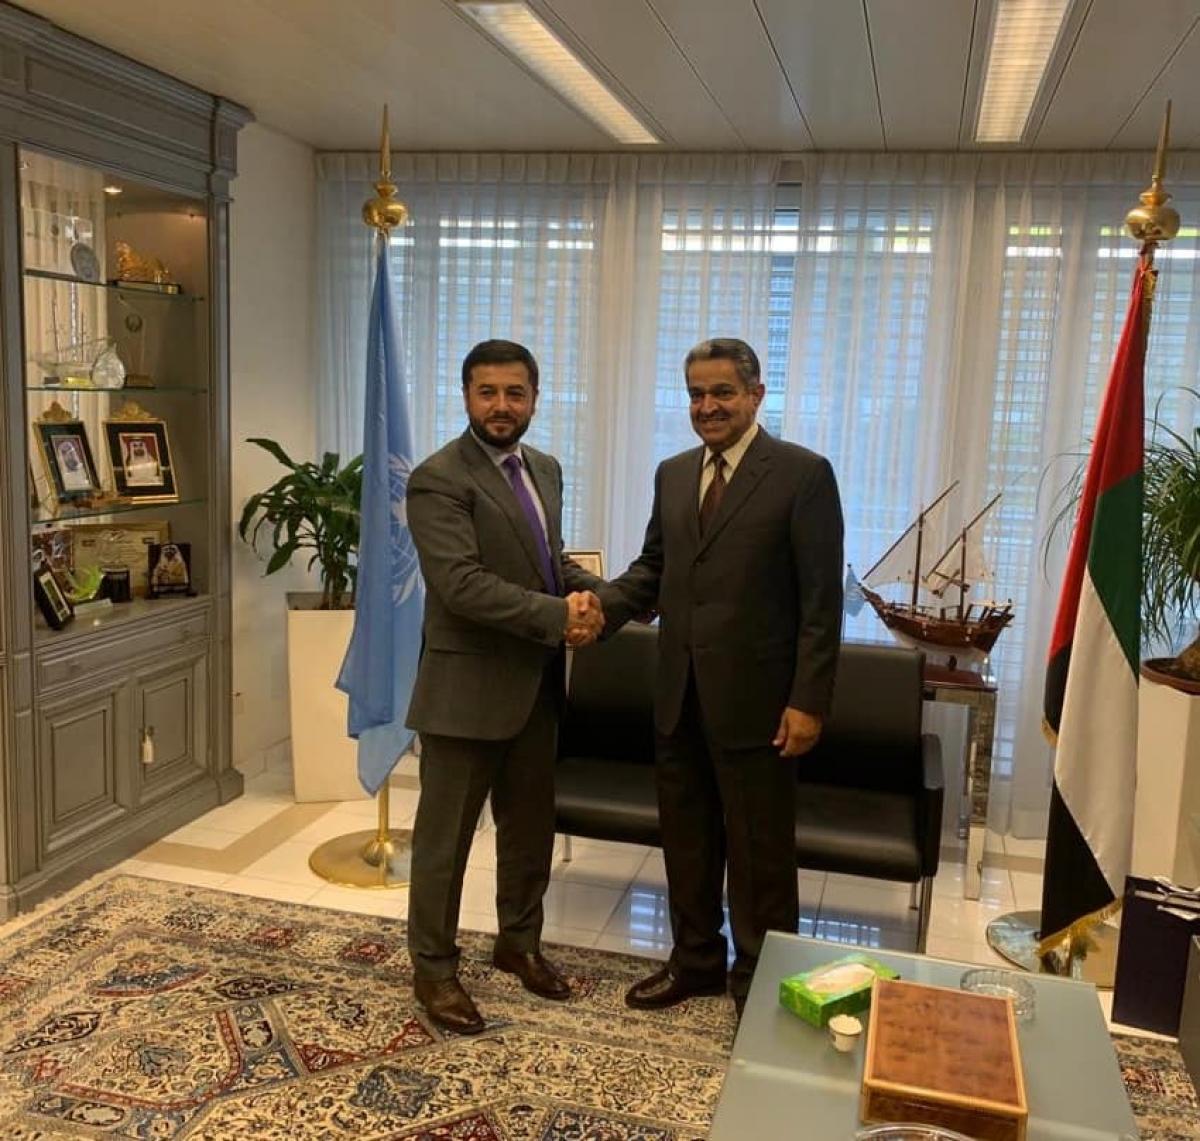 Ambassador Nasir Andisha paid a courtesy visit with the UAE Ambassador Obaid Salem Saeed Nasser Alzaabi.